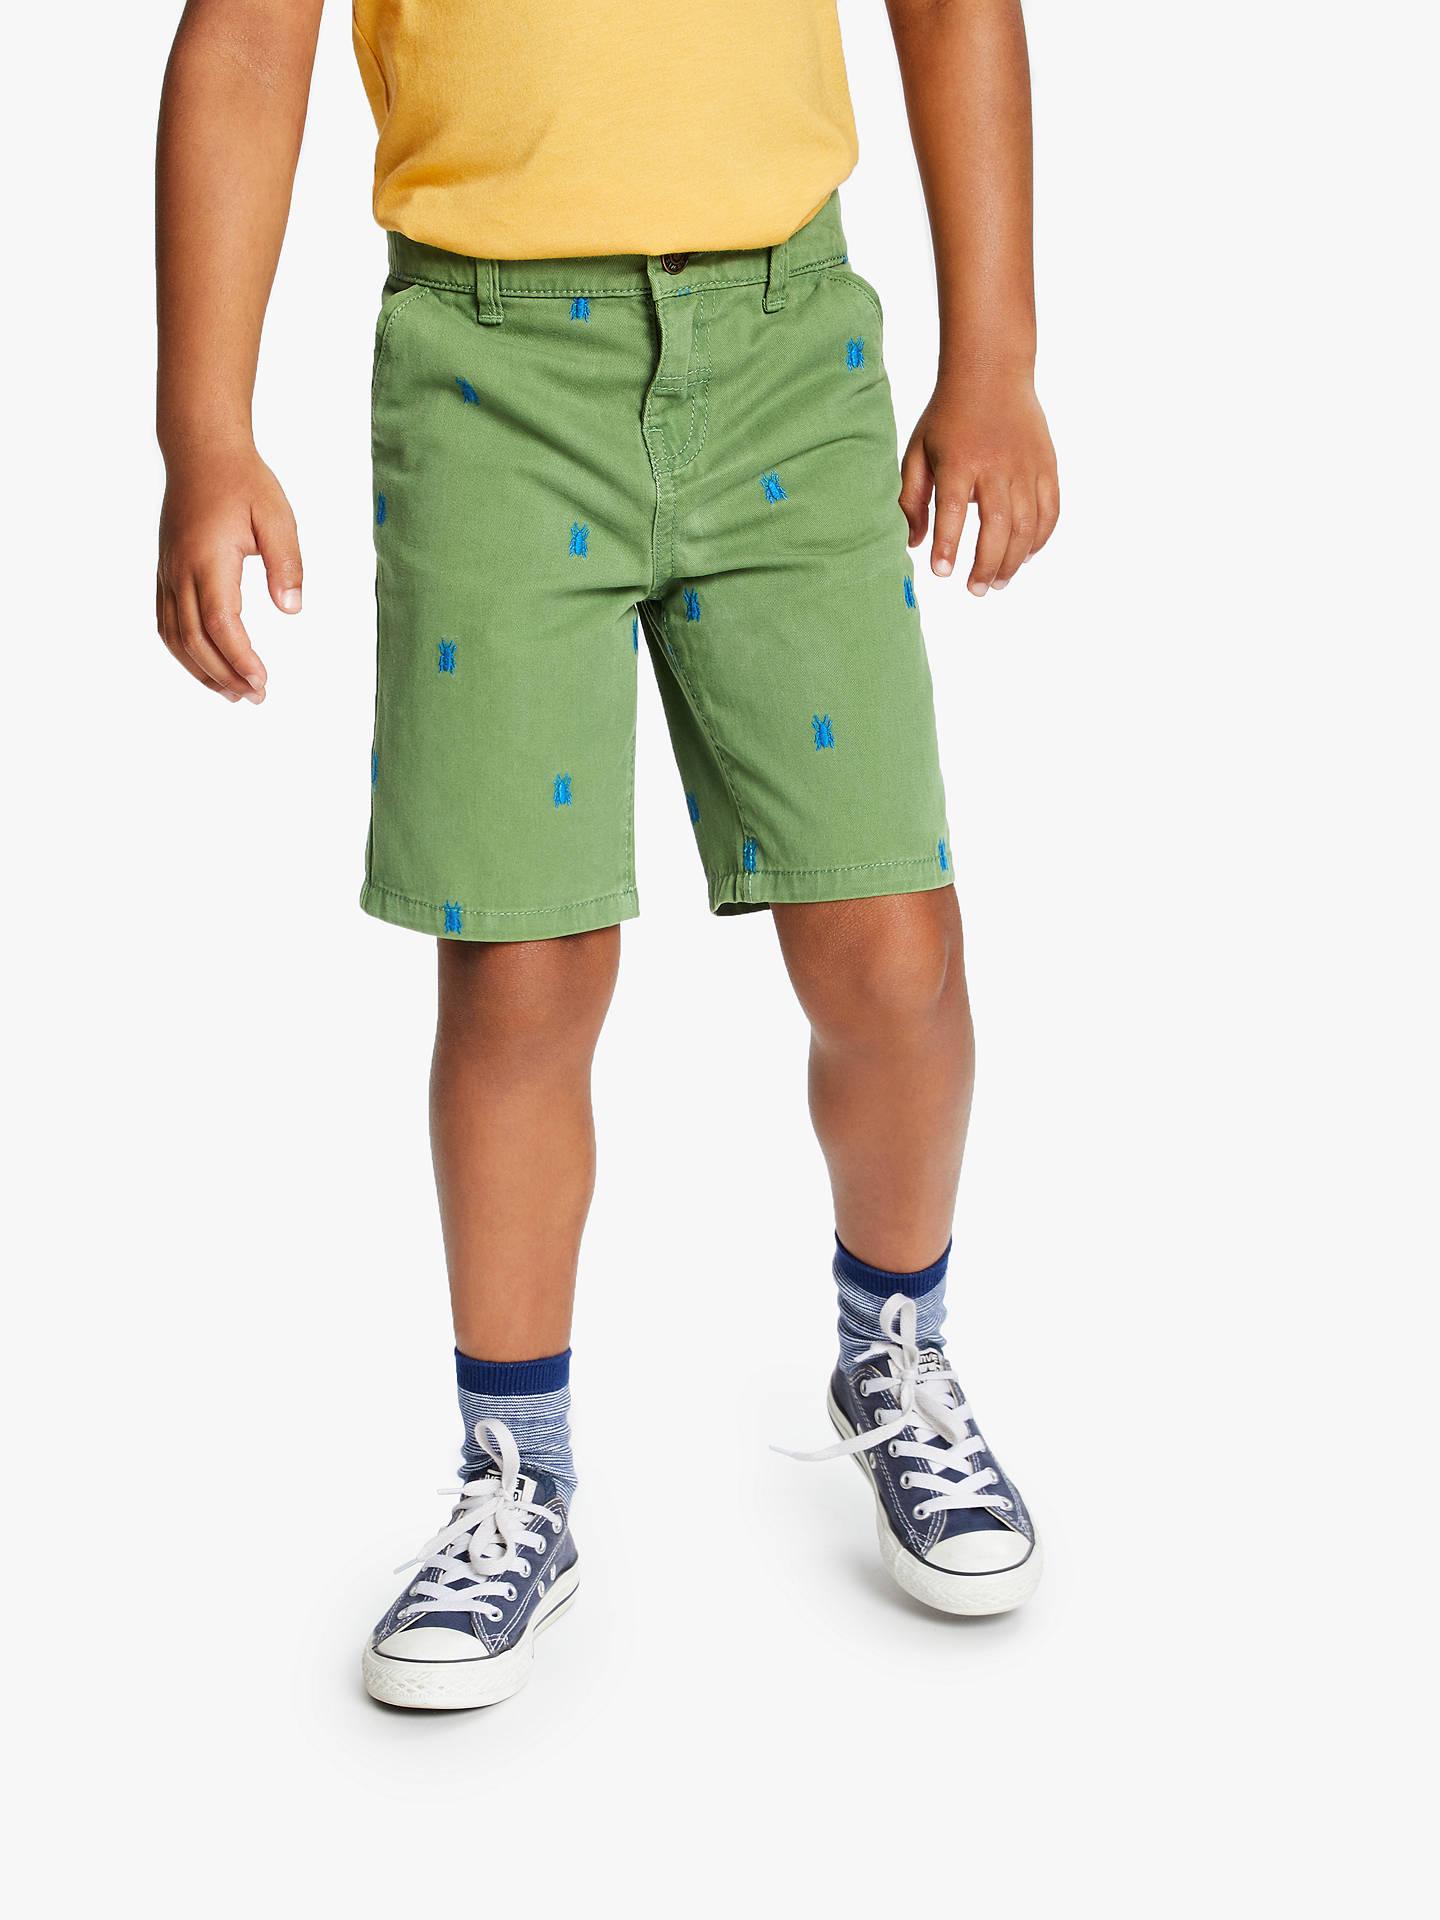 BuyJohn Lewis   Partners Boys  Bug Embroidered Shorts 94b3410ef28a